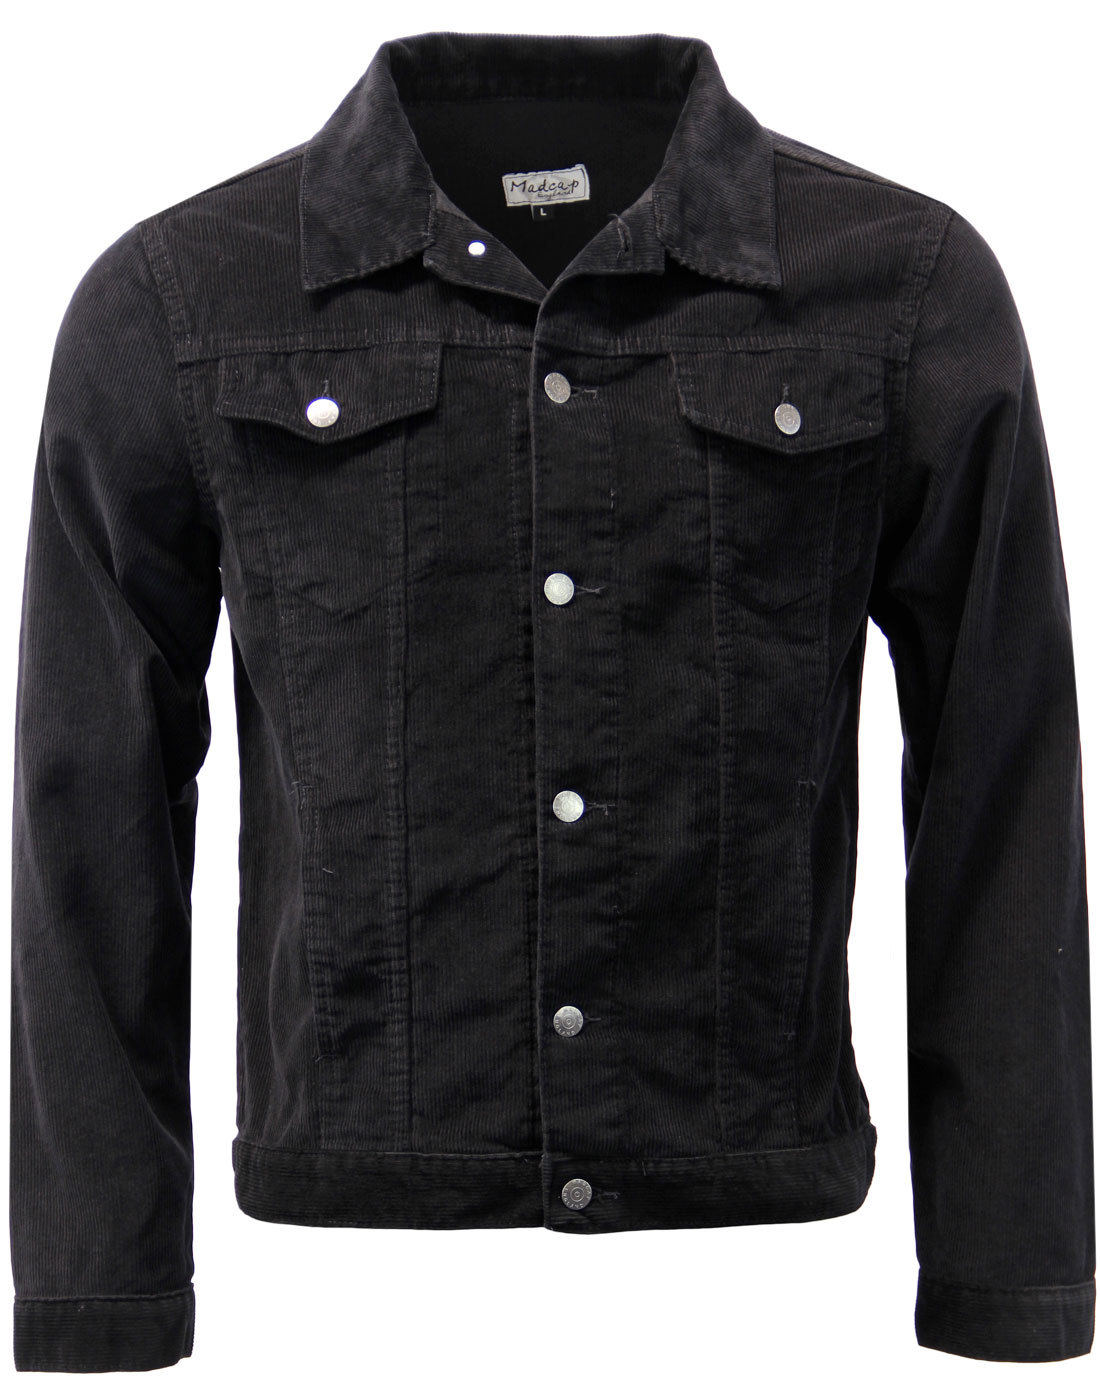 Woburn MADCAP ENGLAND Mod Cord Western Jacket (Bl)